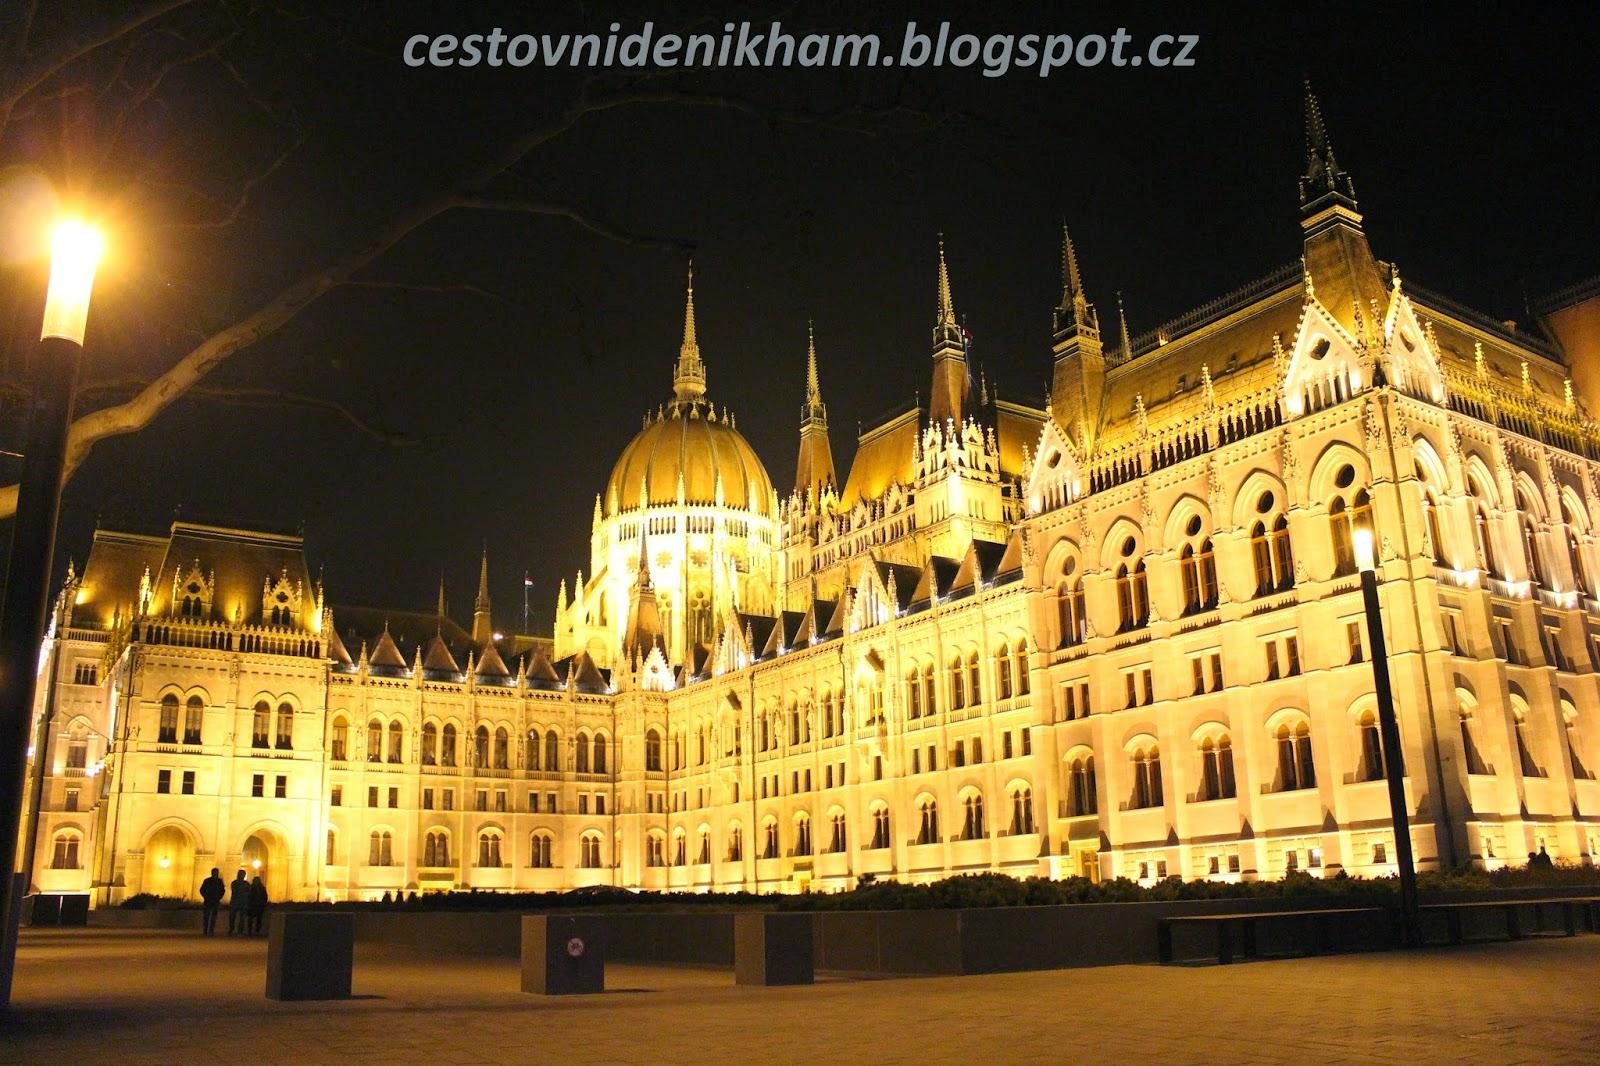 maďarský parlament // Hungarian Parliament